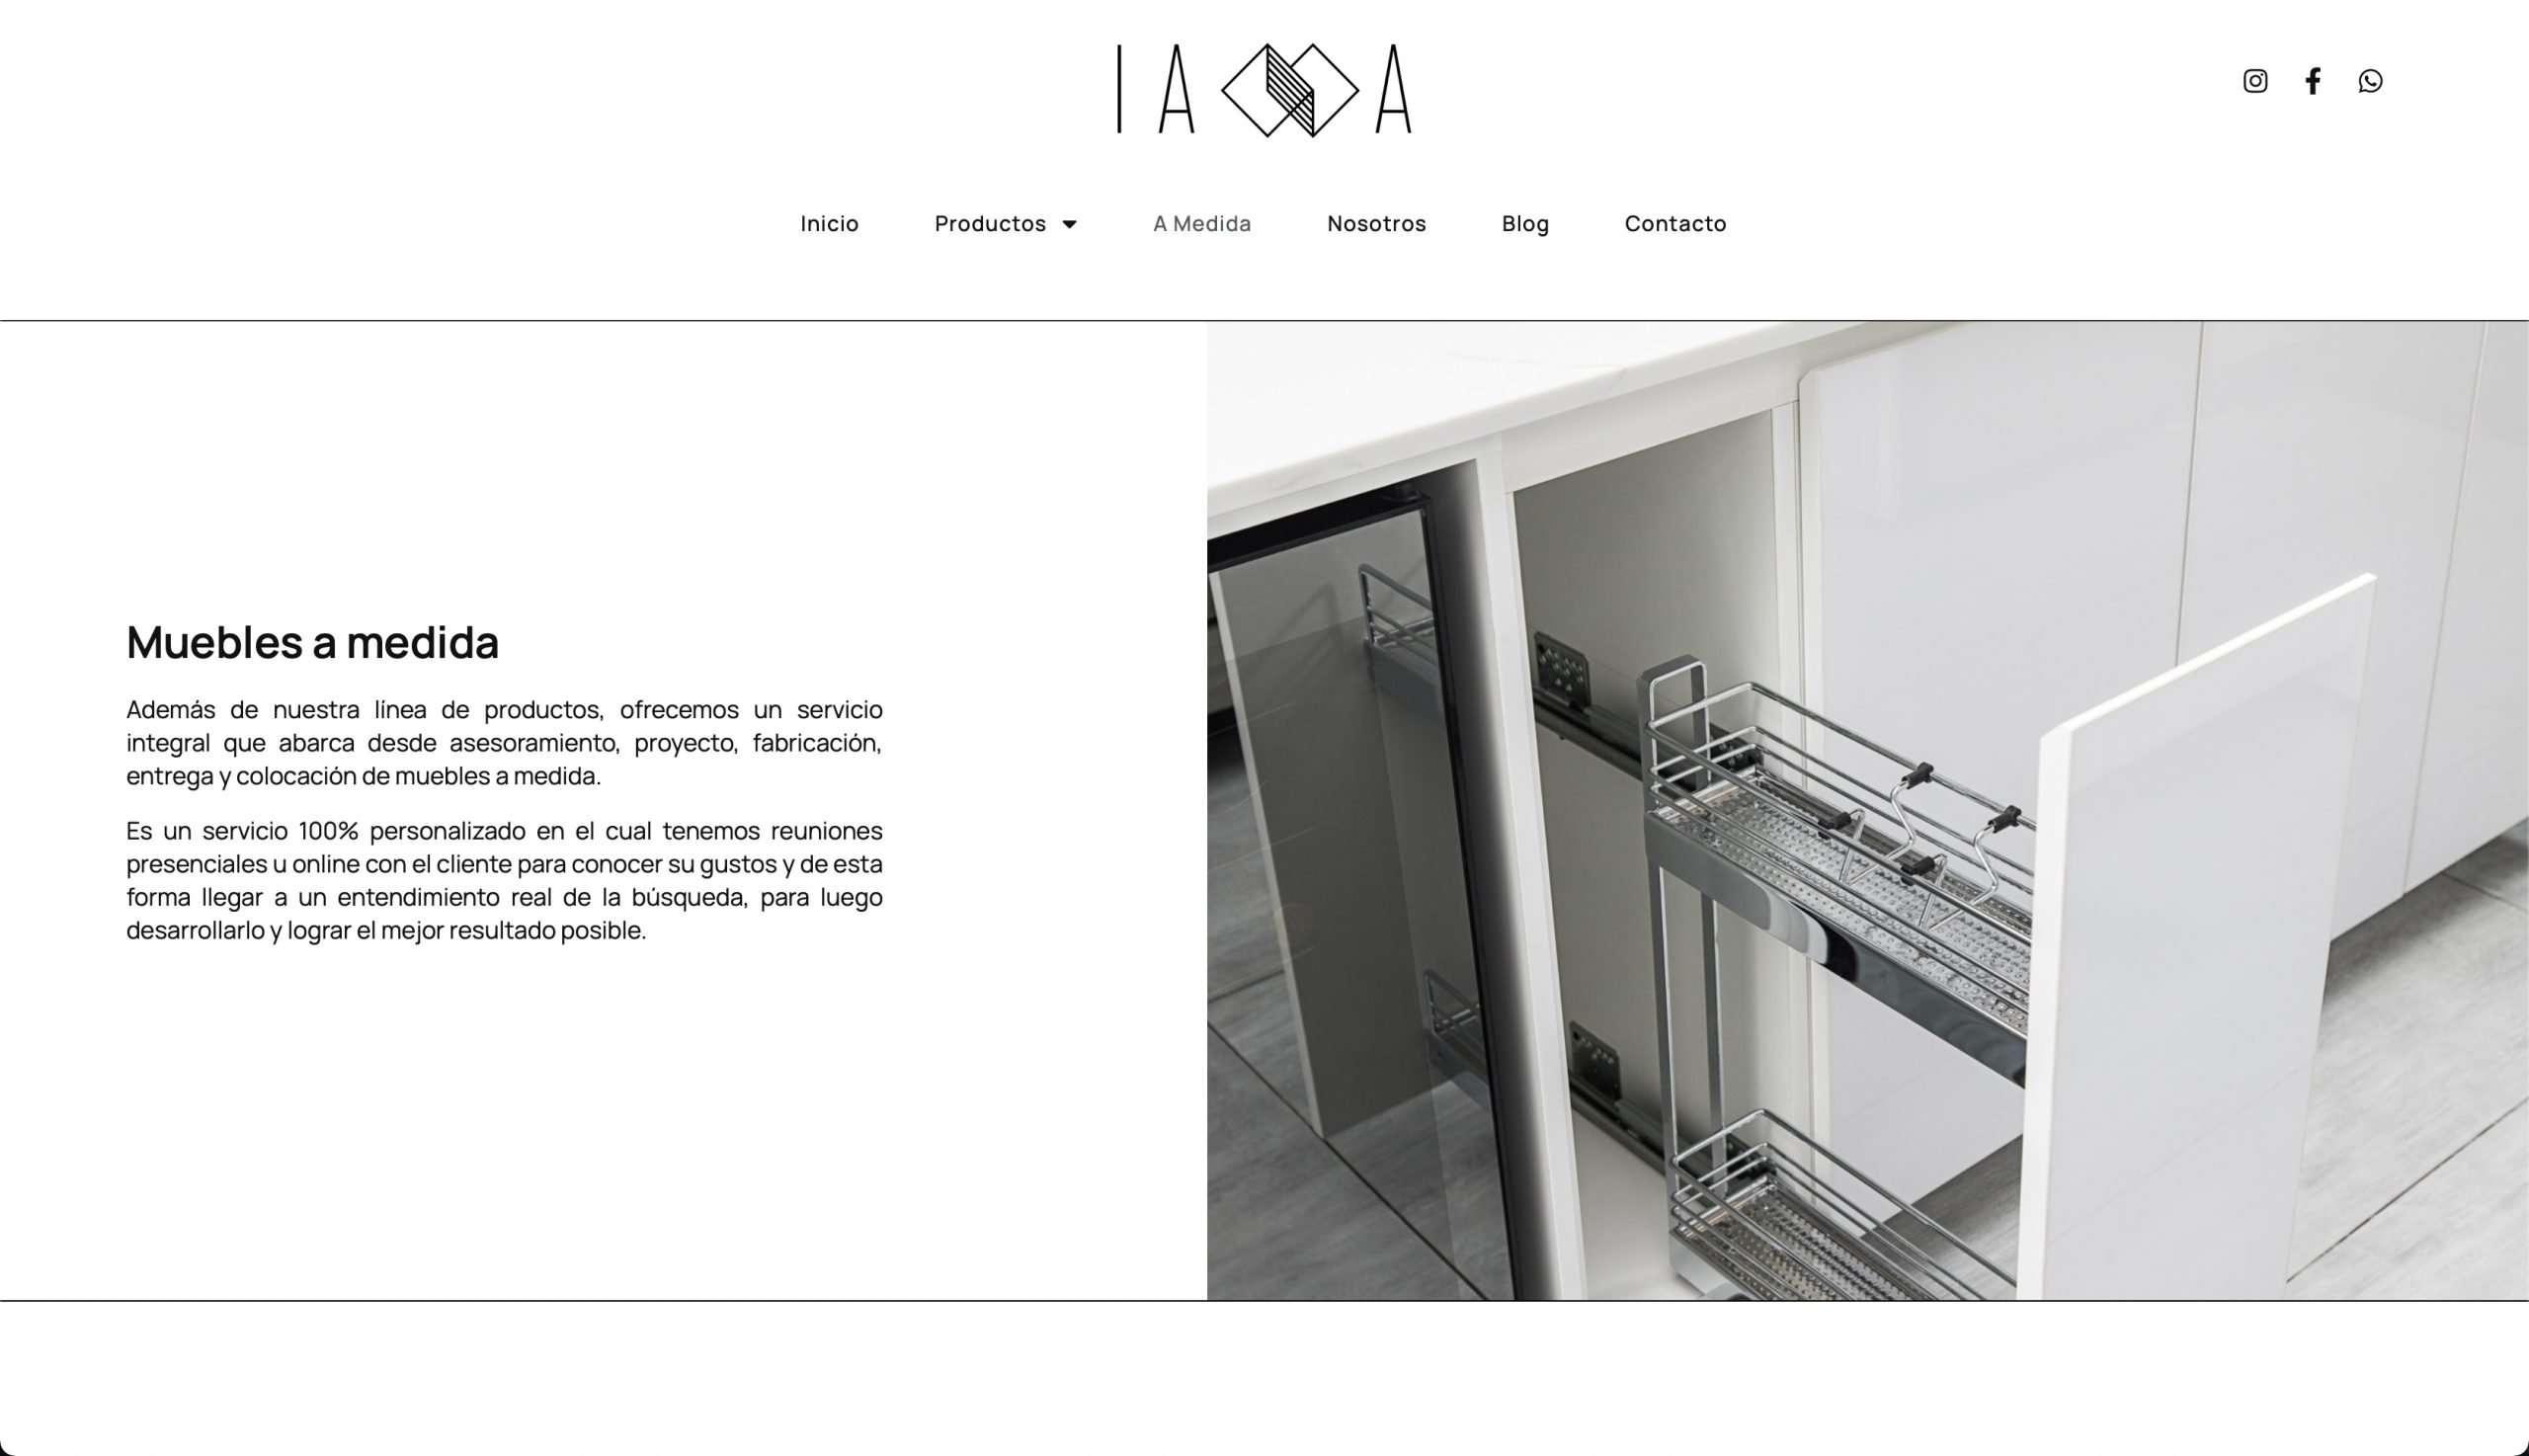 iana-muebles-online-lab-web-development-web-design-6